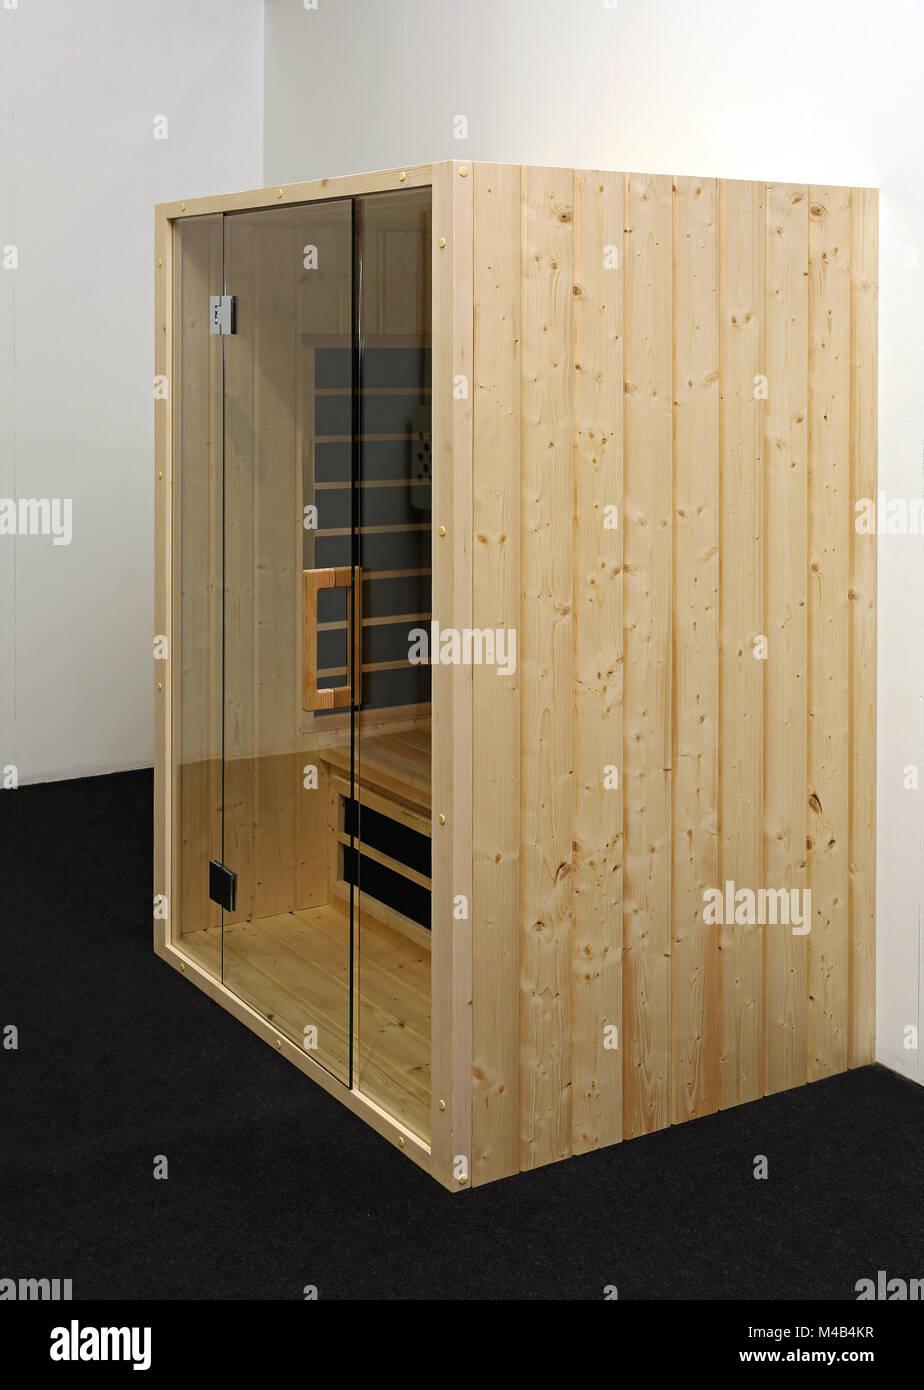 Small Wooden Box Sauna in Home Stock Photo: 174807467 - Alamy